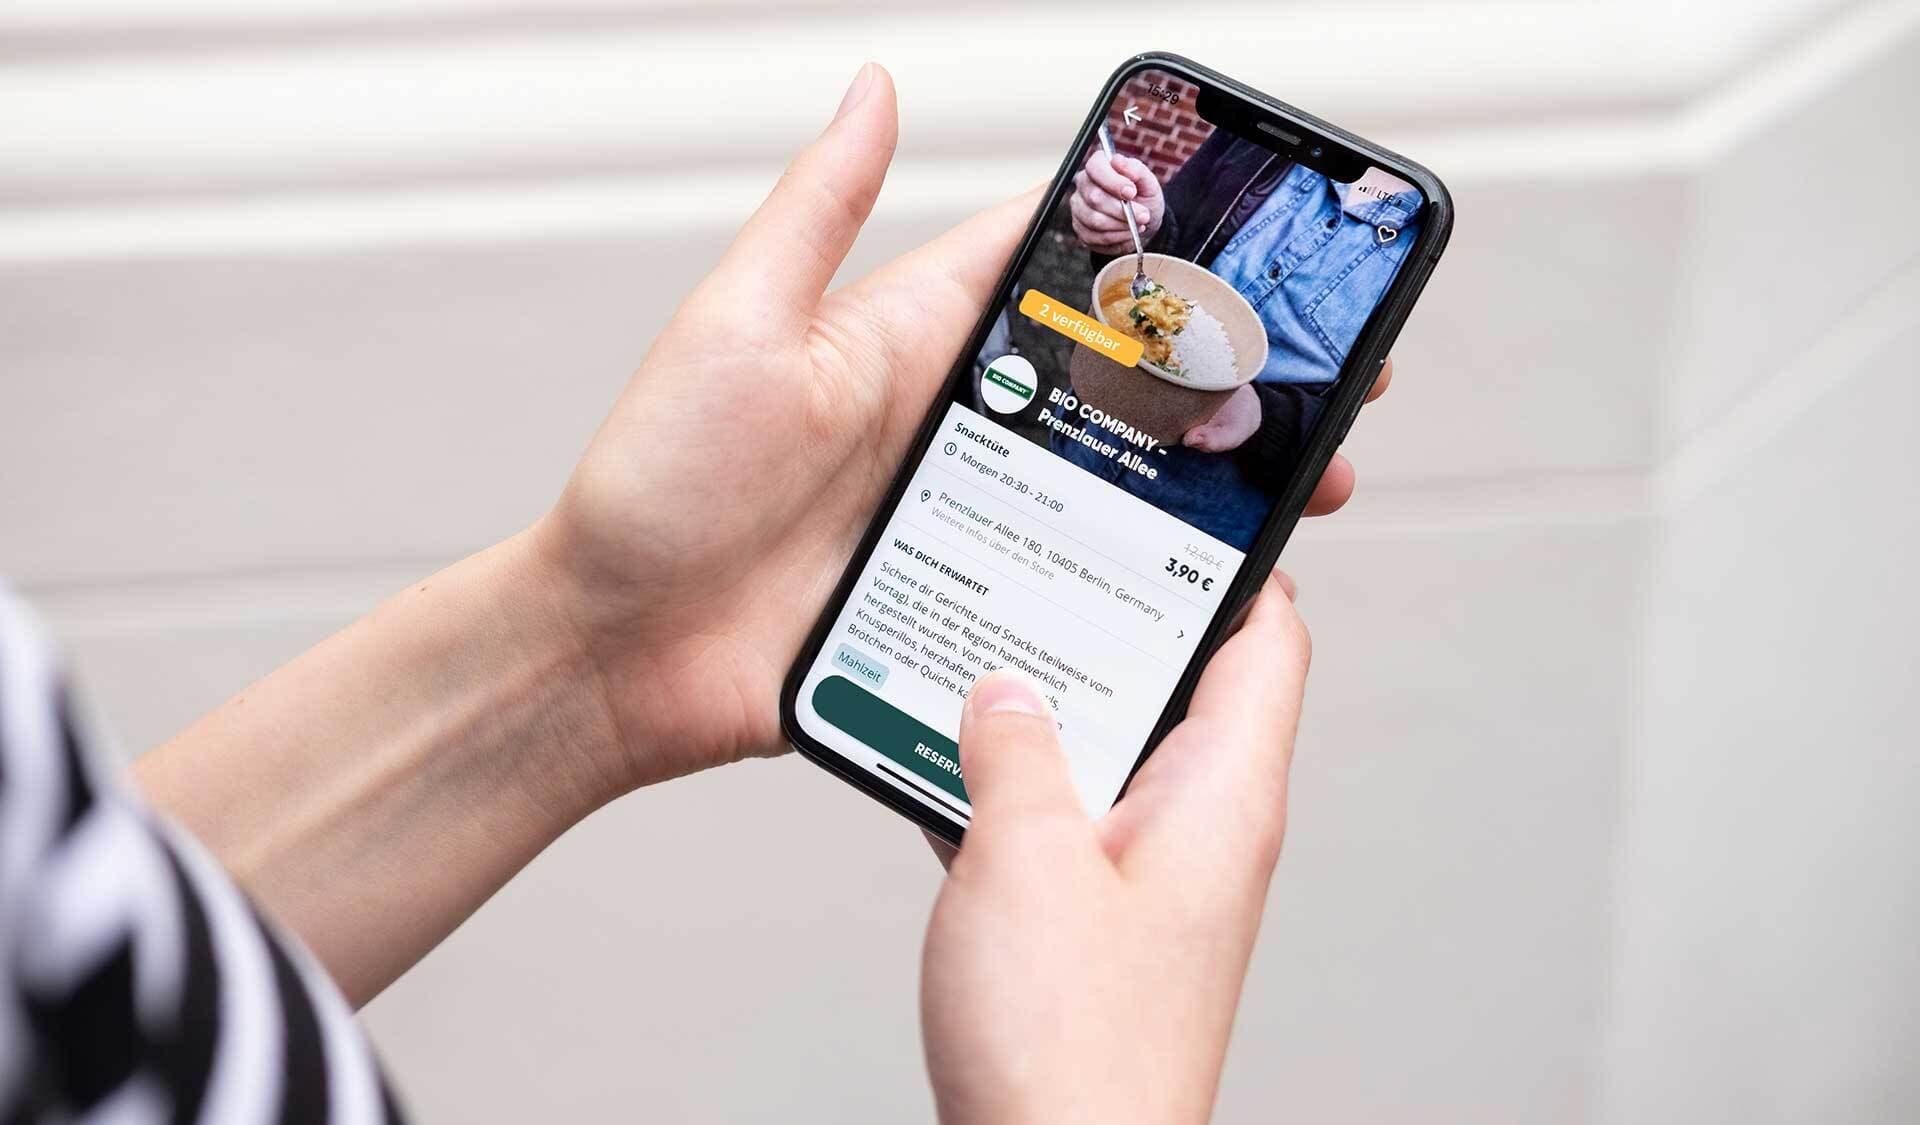 Smartphone, TooGoodToGo-App geöffnet, Oberfläche der BioCompany